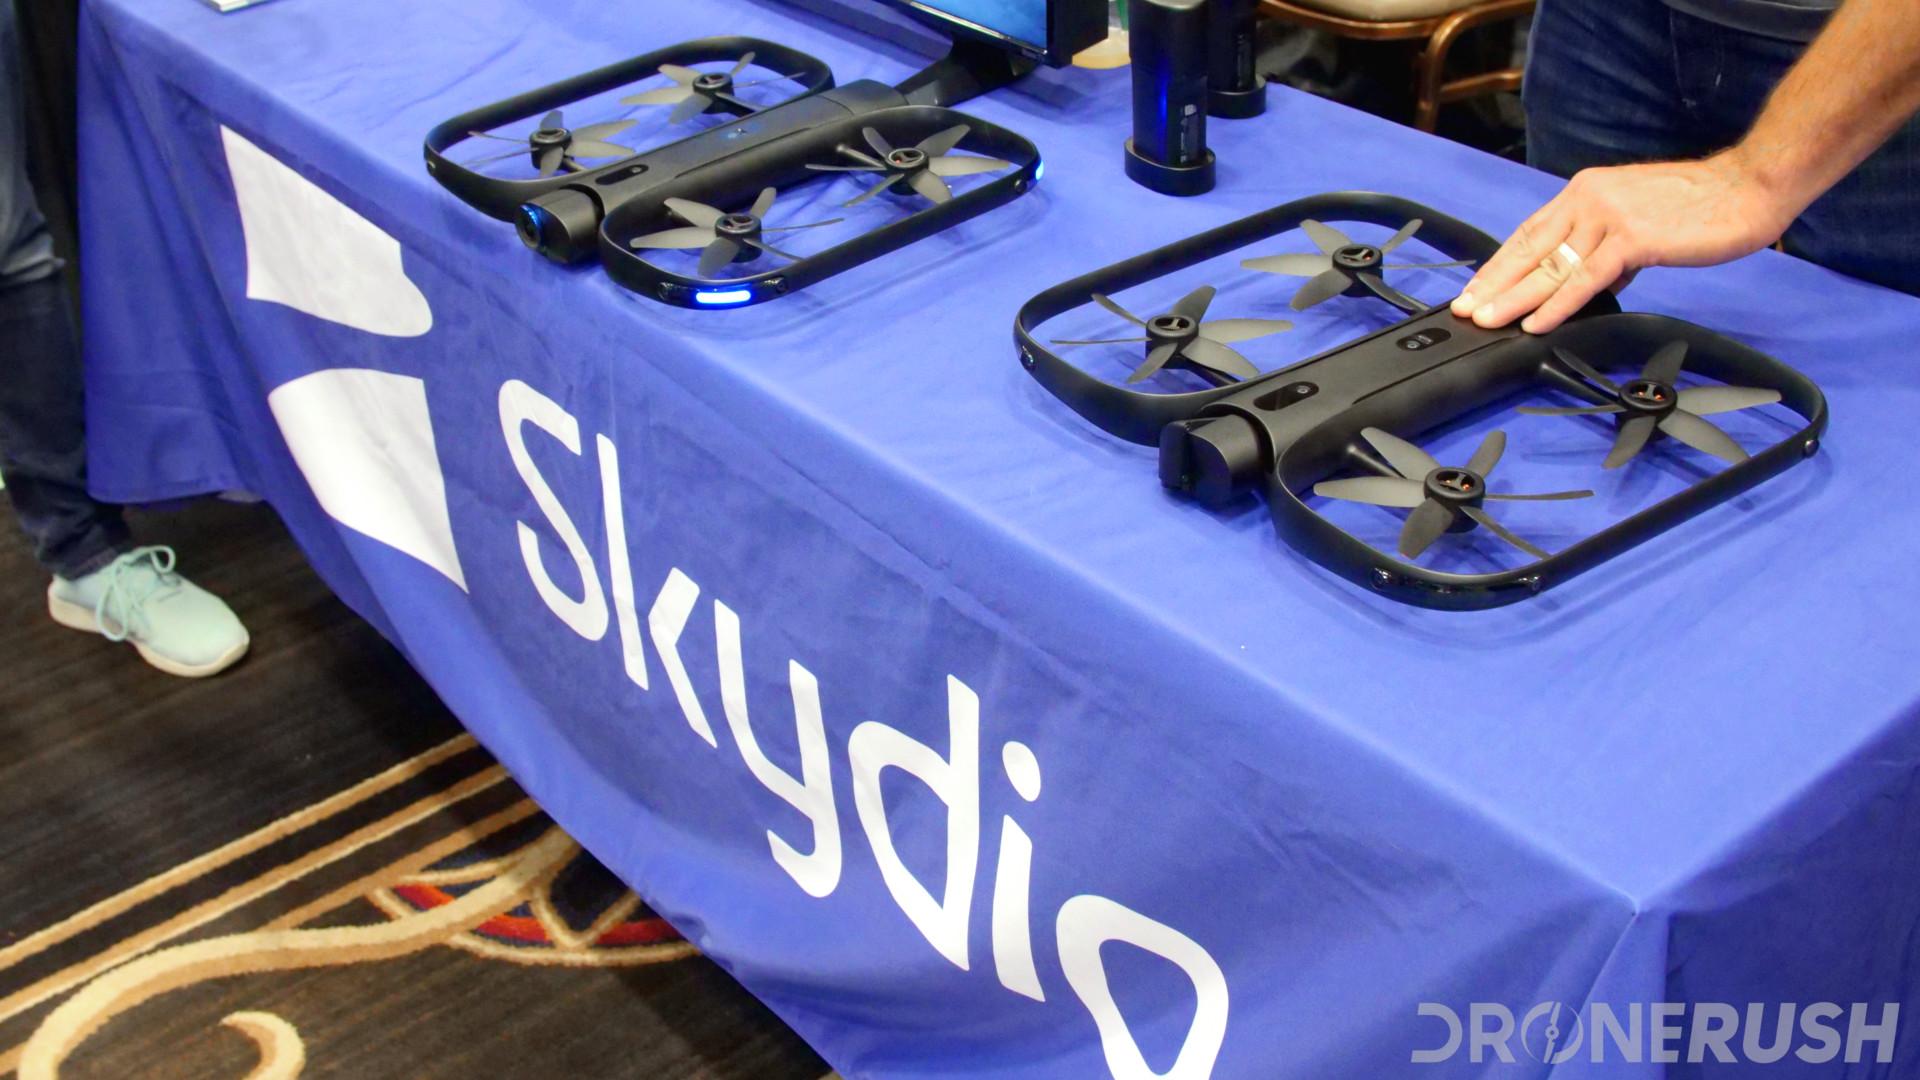 Skydio R1 at InterDrone 2018